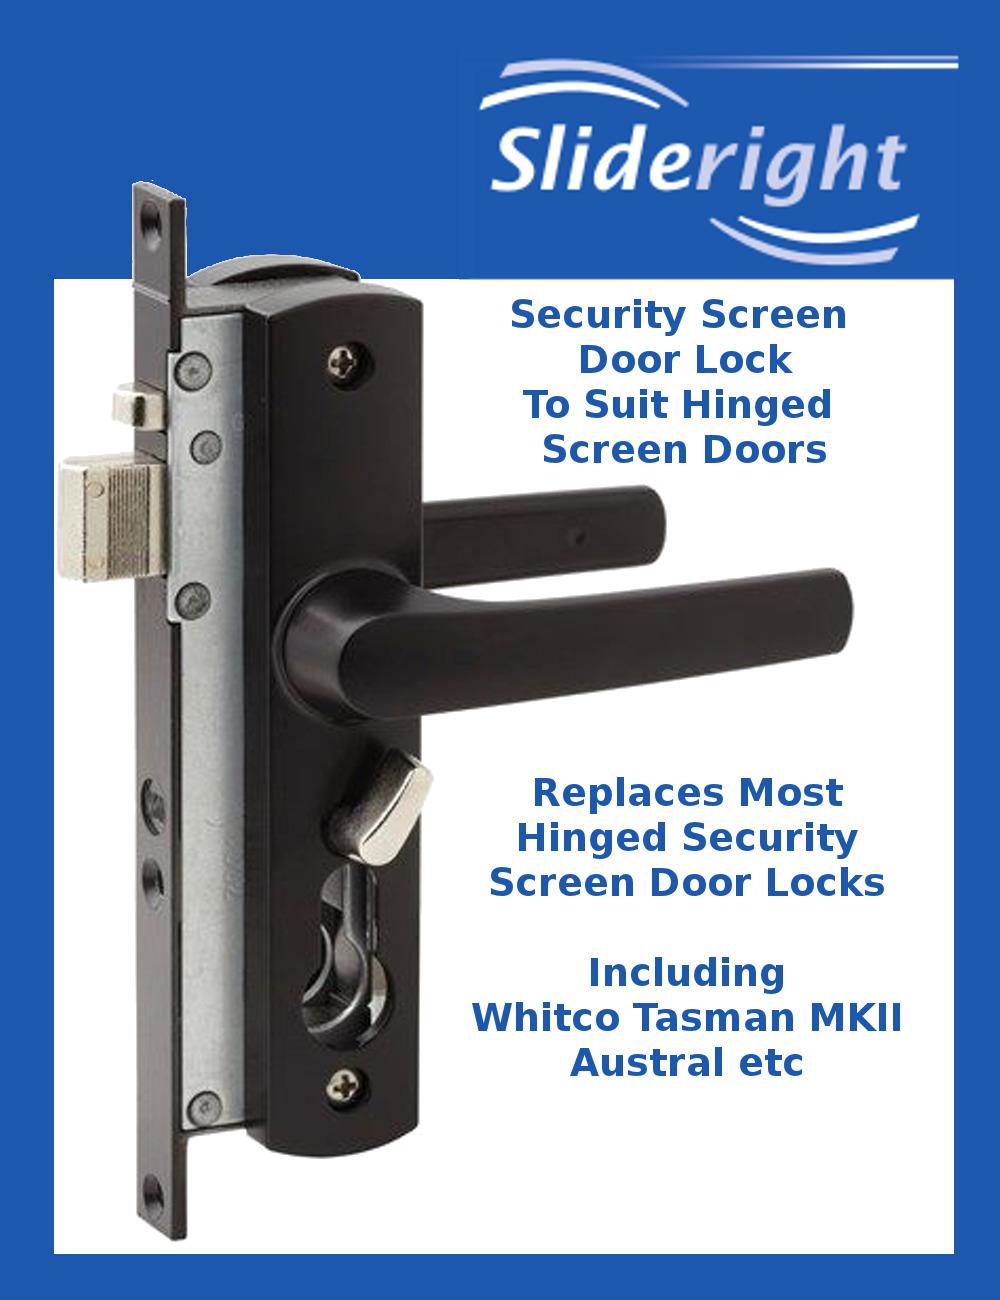 Security Screen Hinged Door Lock Whitco Tasman Mk2 Equivalent Black